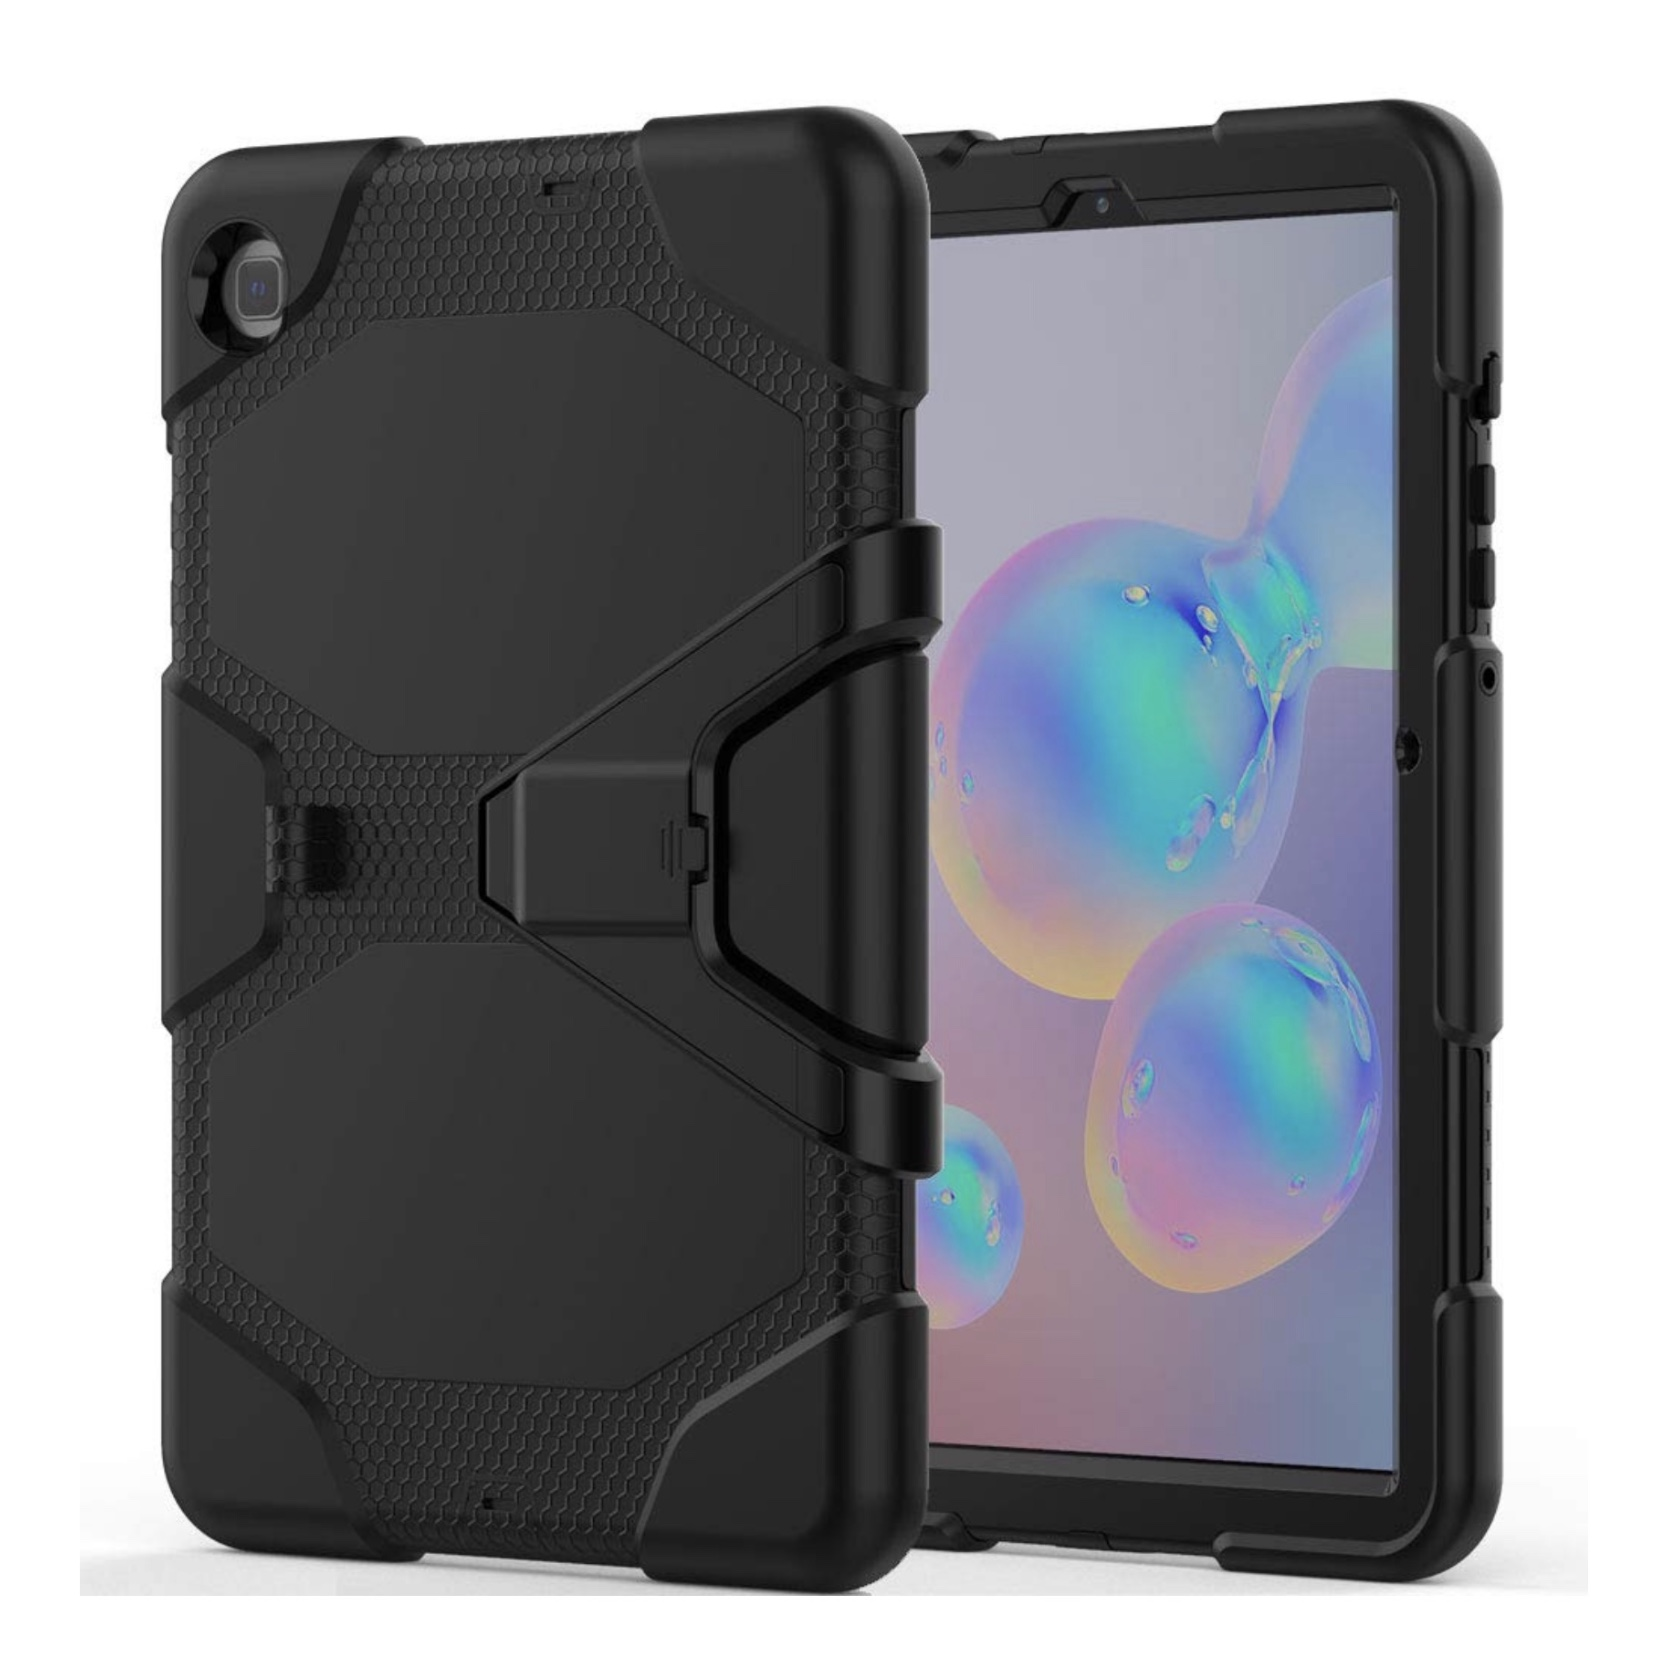 Vegas Galaxy TAB S6 LITE 10.4 pouces Coque renforcee et film rigide ecran